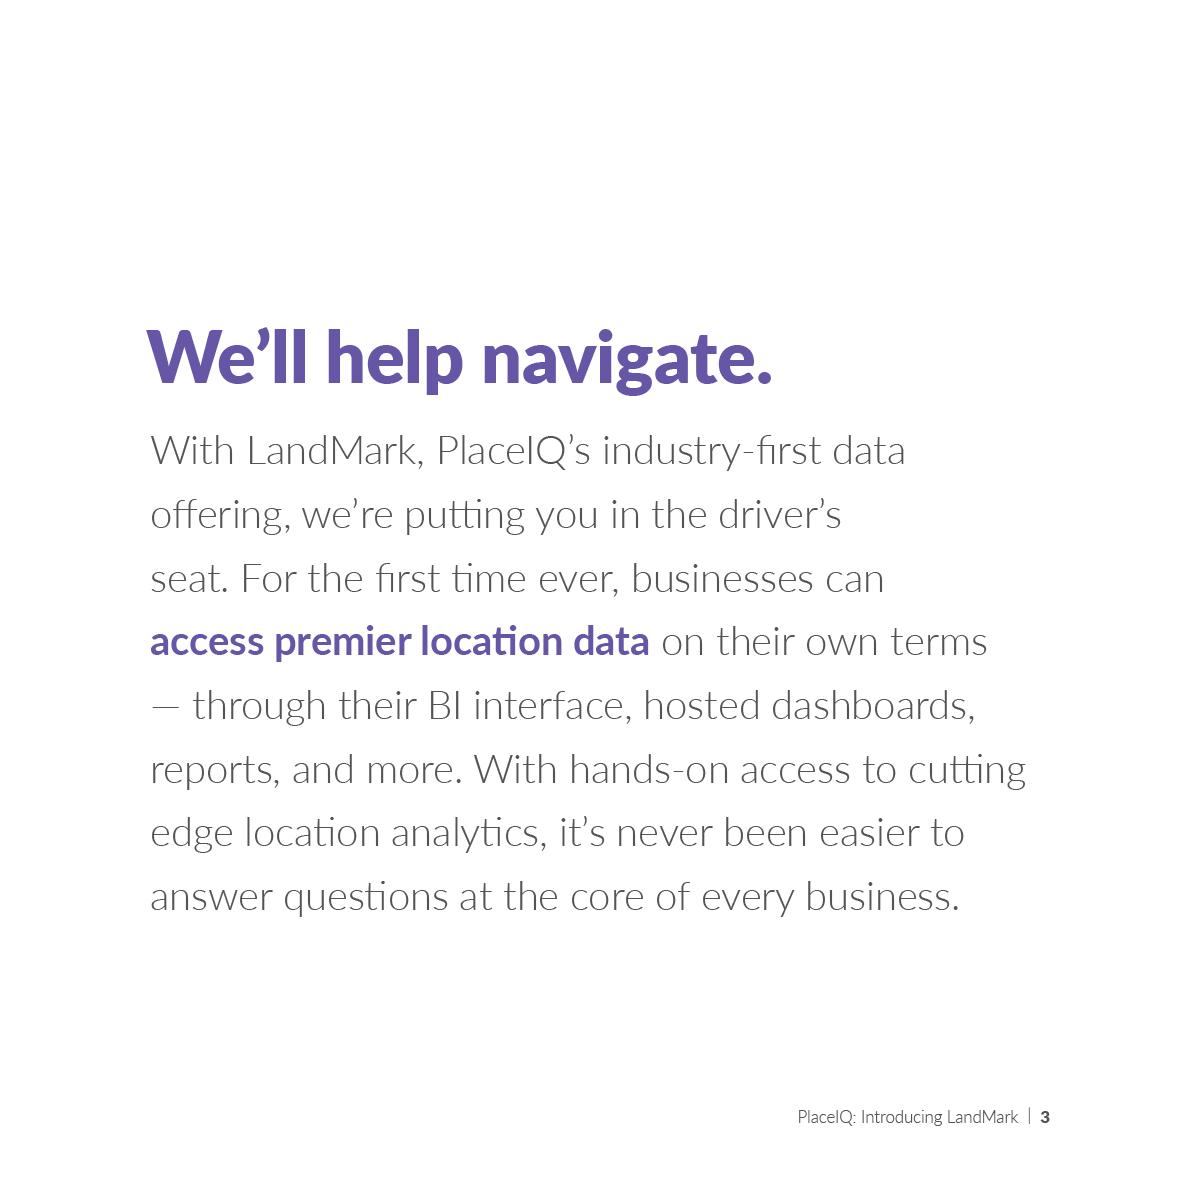 We'll help navigate.